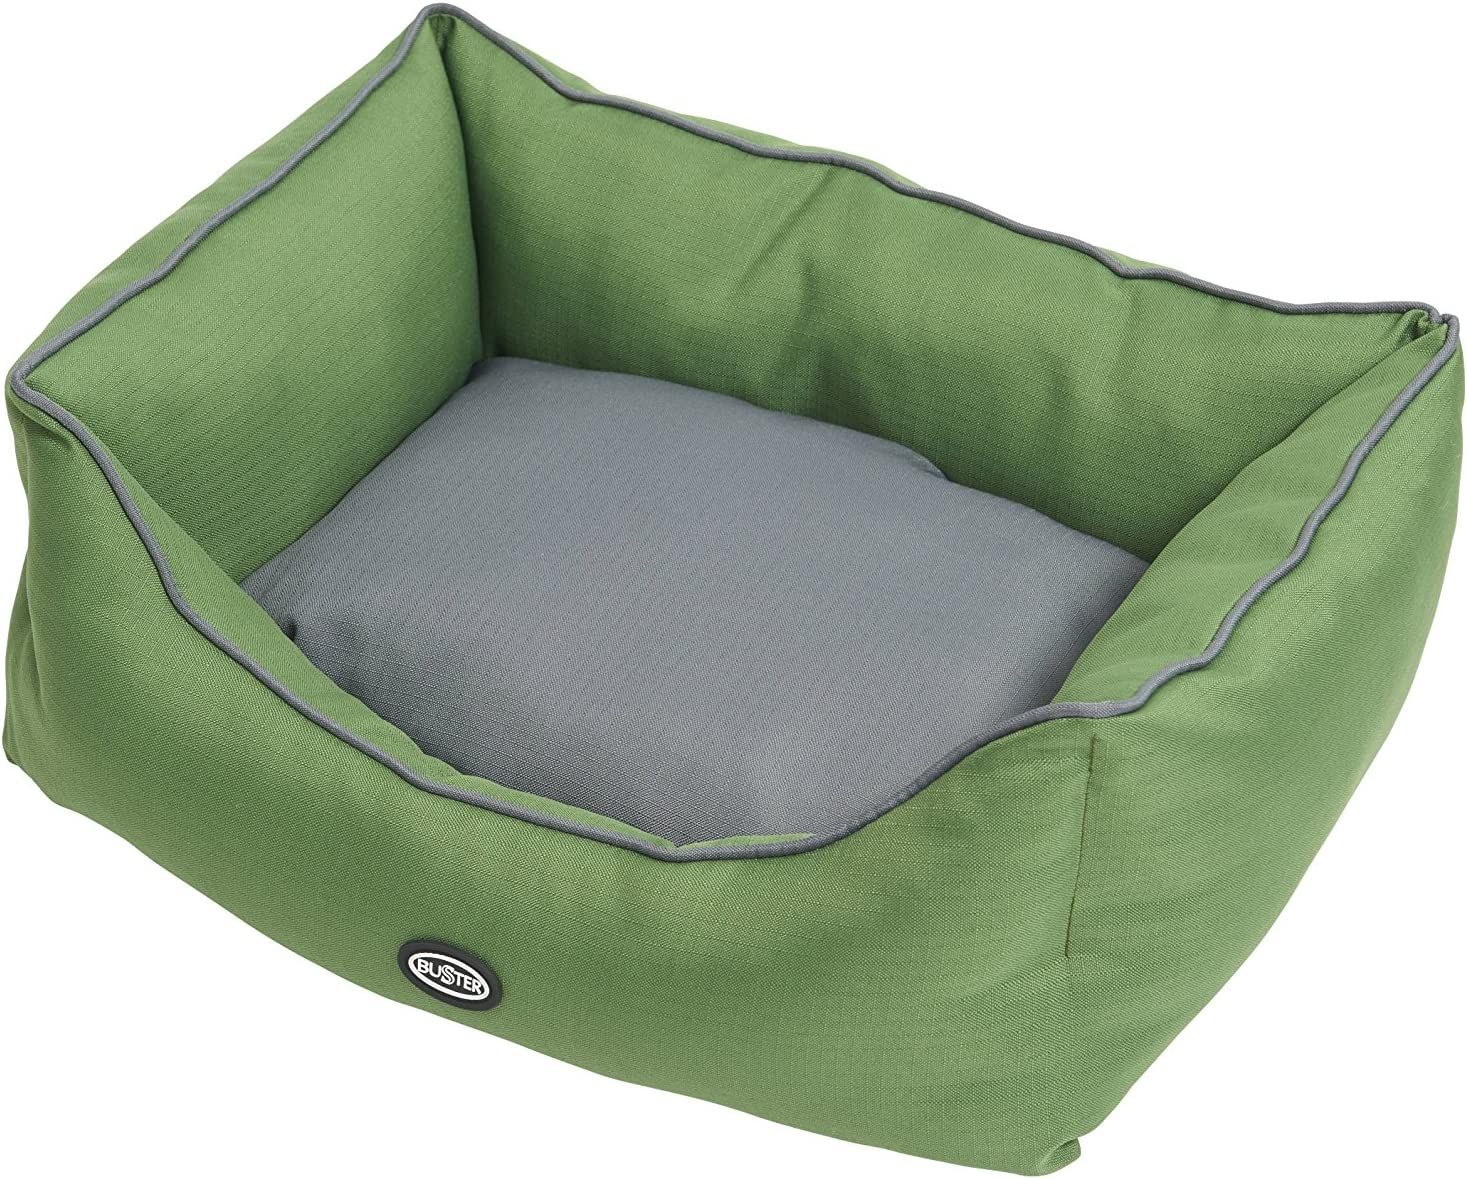 Kruuse Buster Sofa Bed Artichoke Green Grey 24 x discount Steel Cheap 45